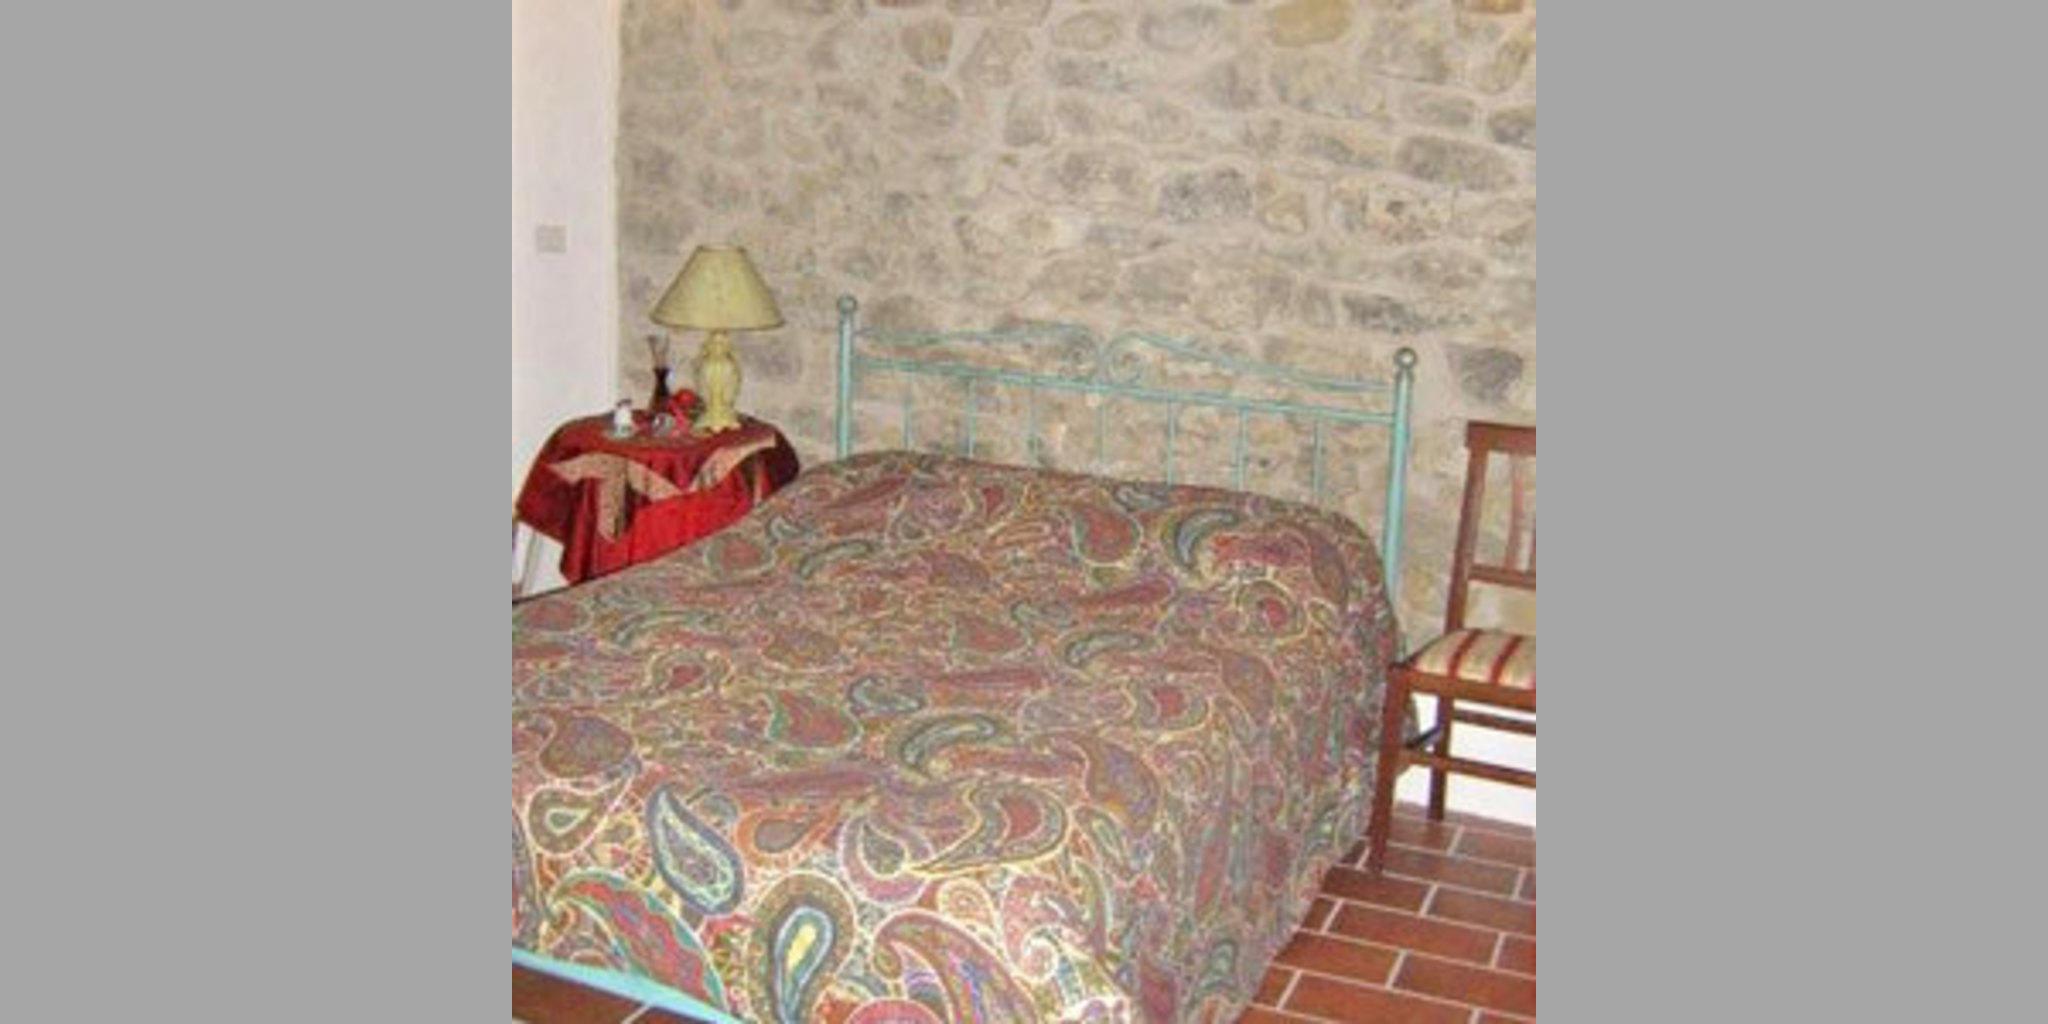 Bed & Breakfast Villafranca In Lunigiana - Calzolari